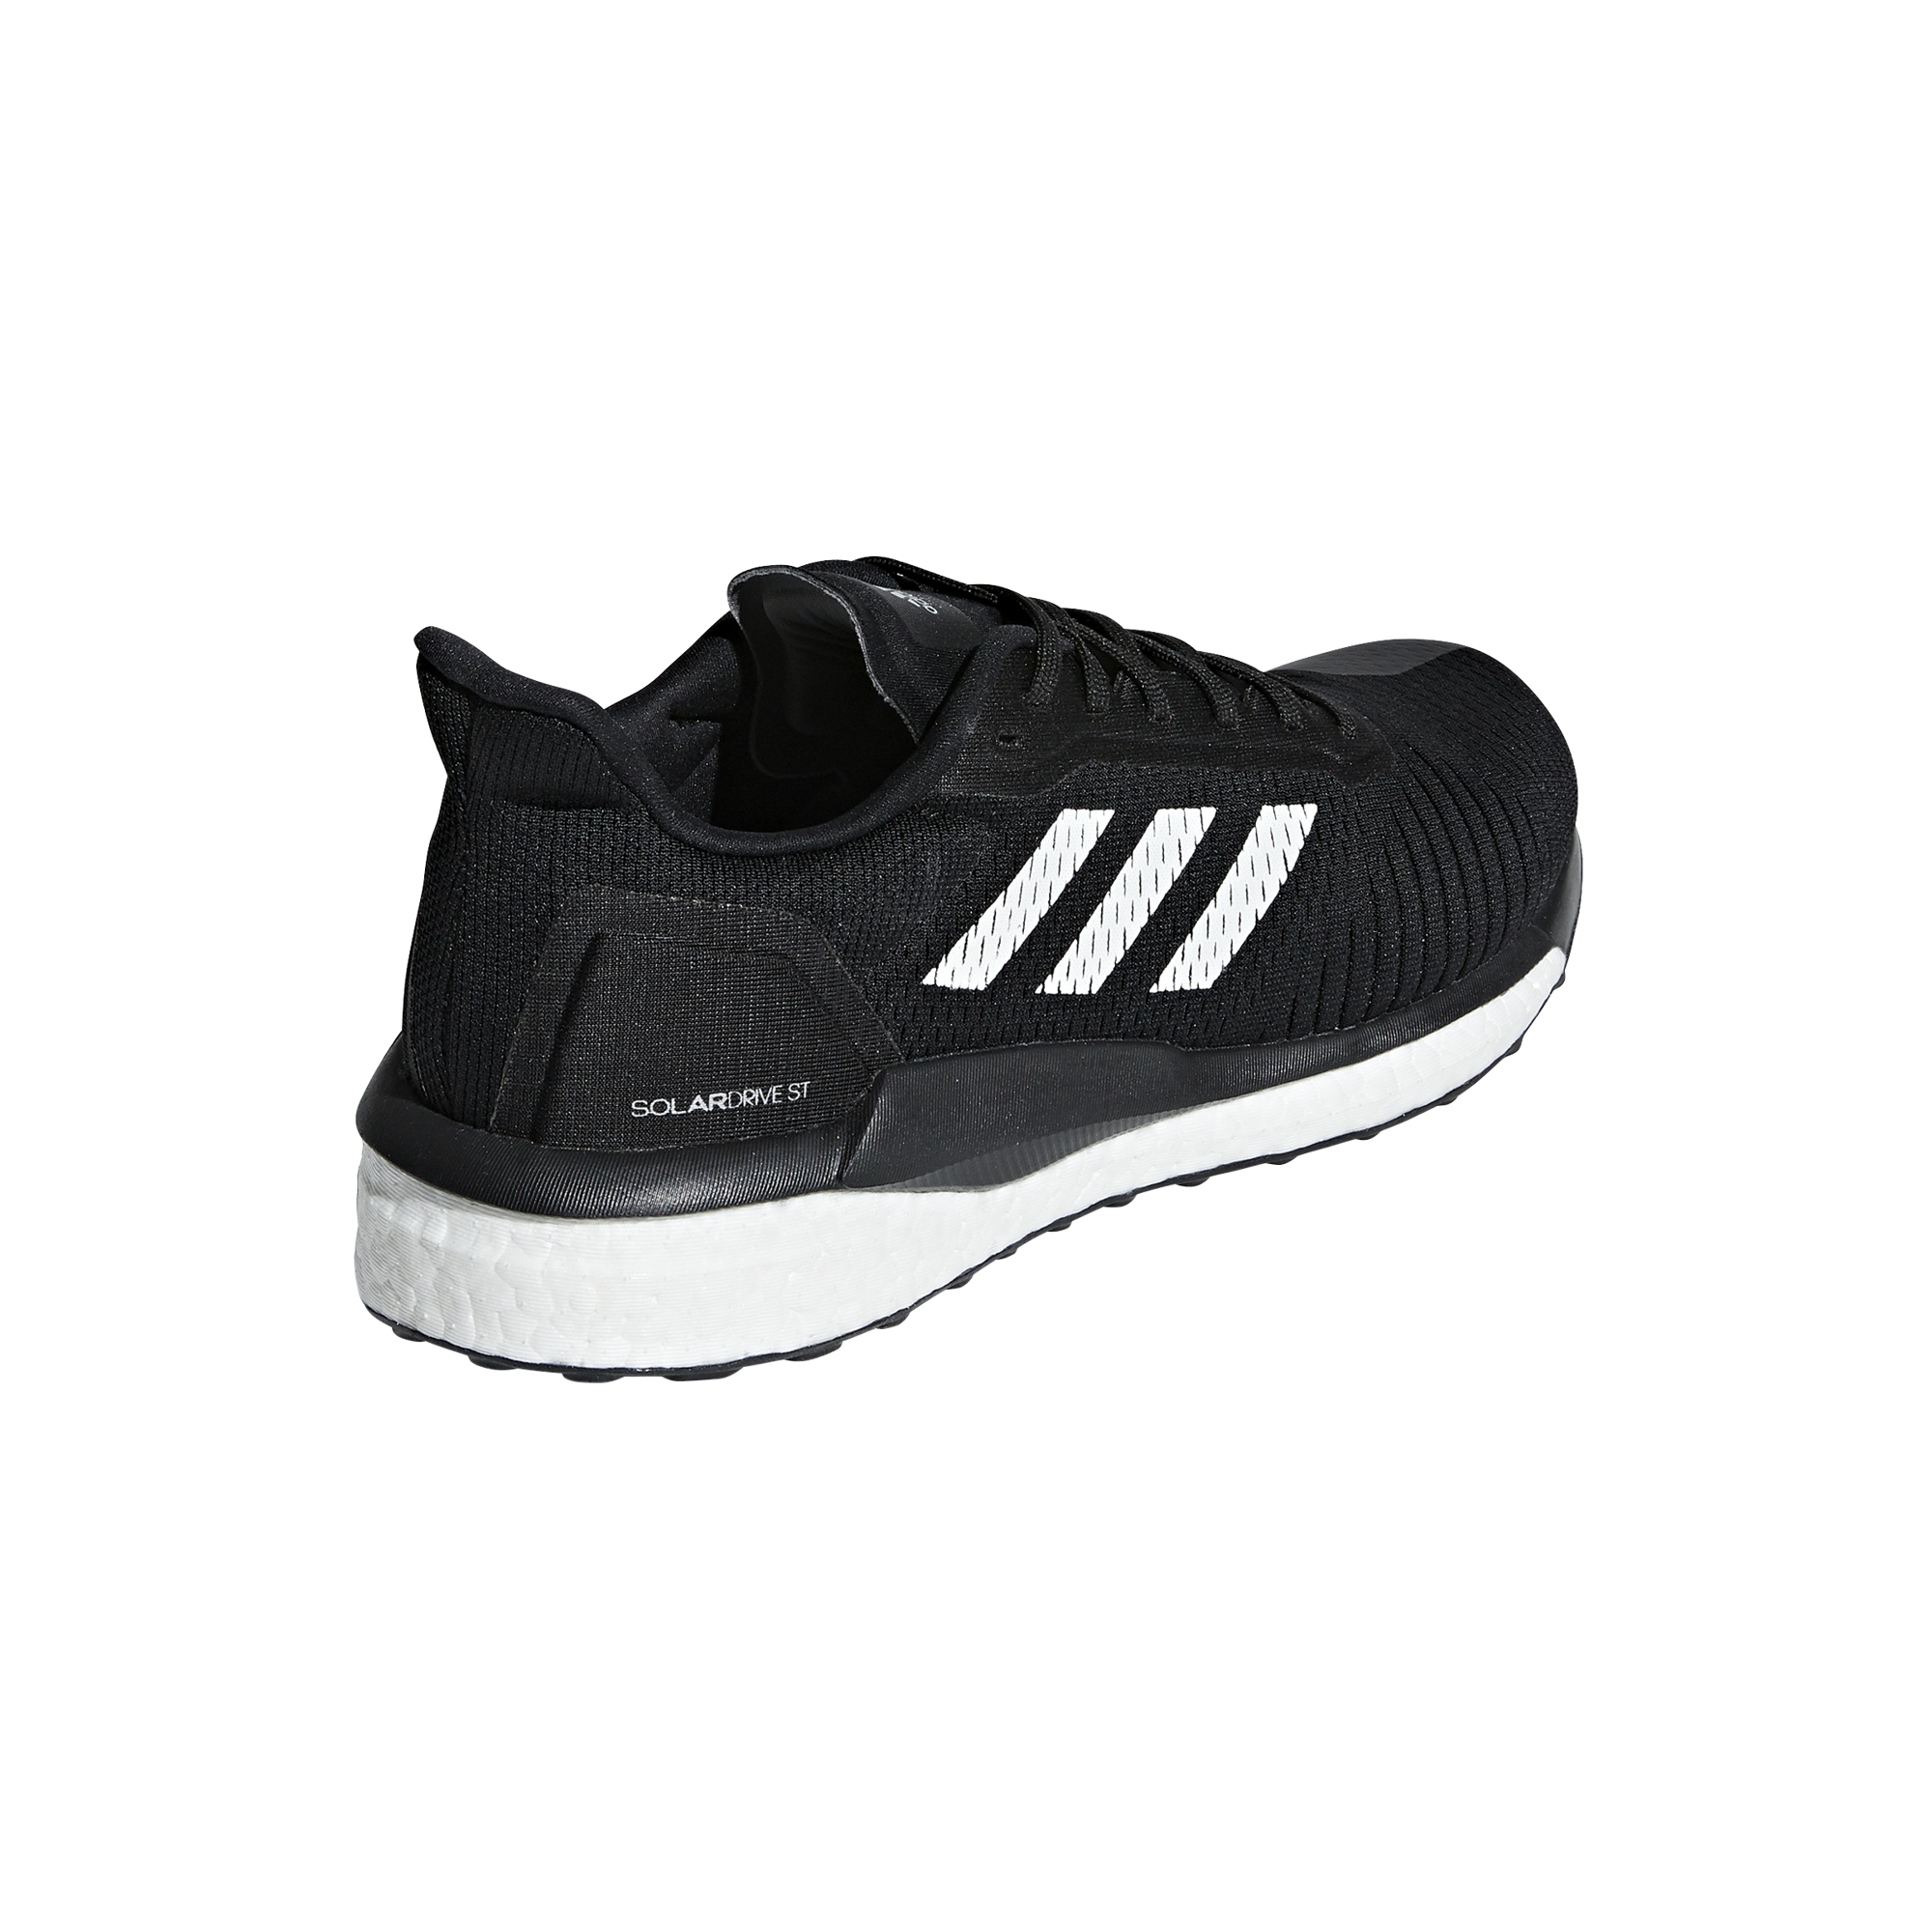 bf571b7d819 Chaussures adidas Solardrive